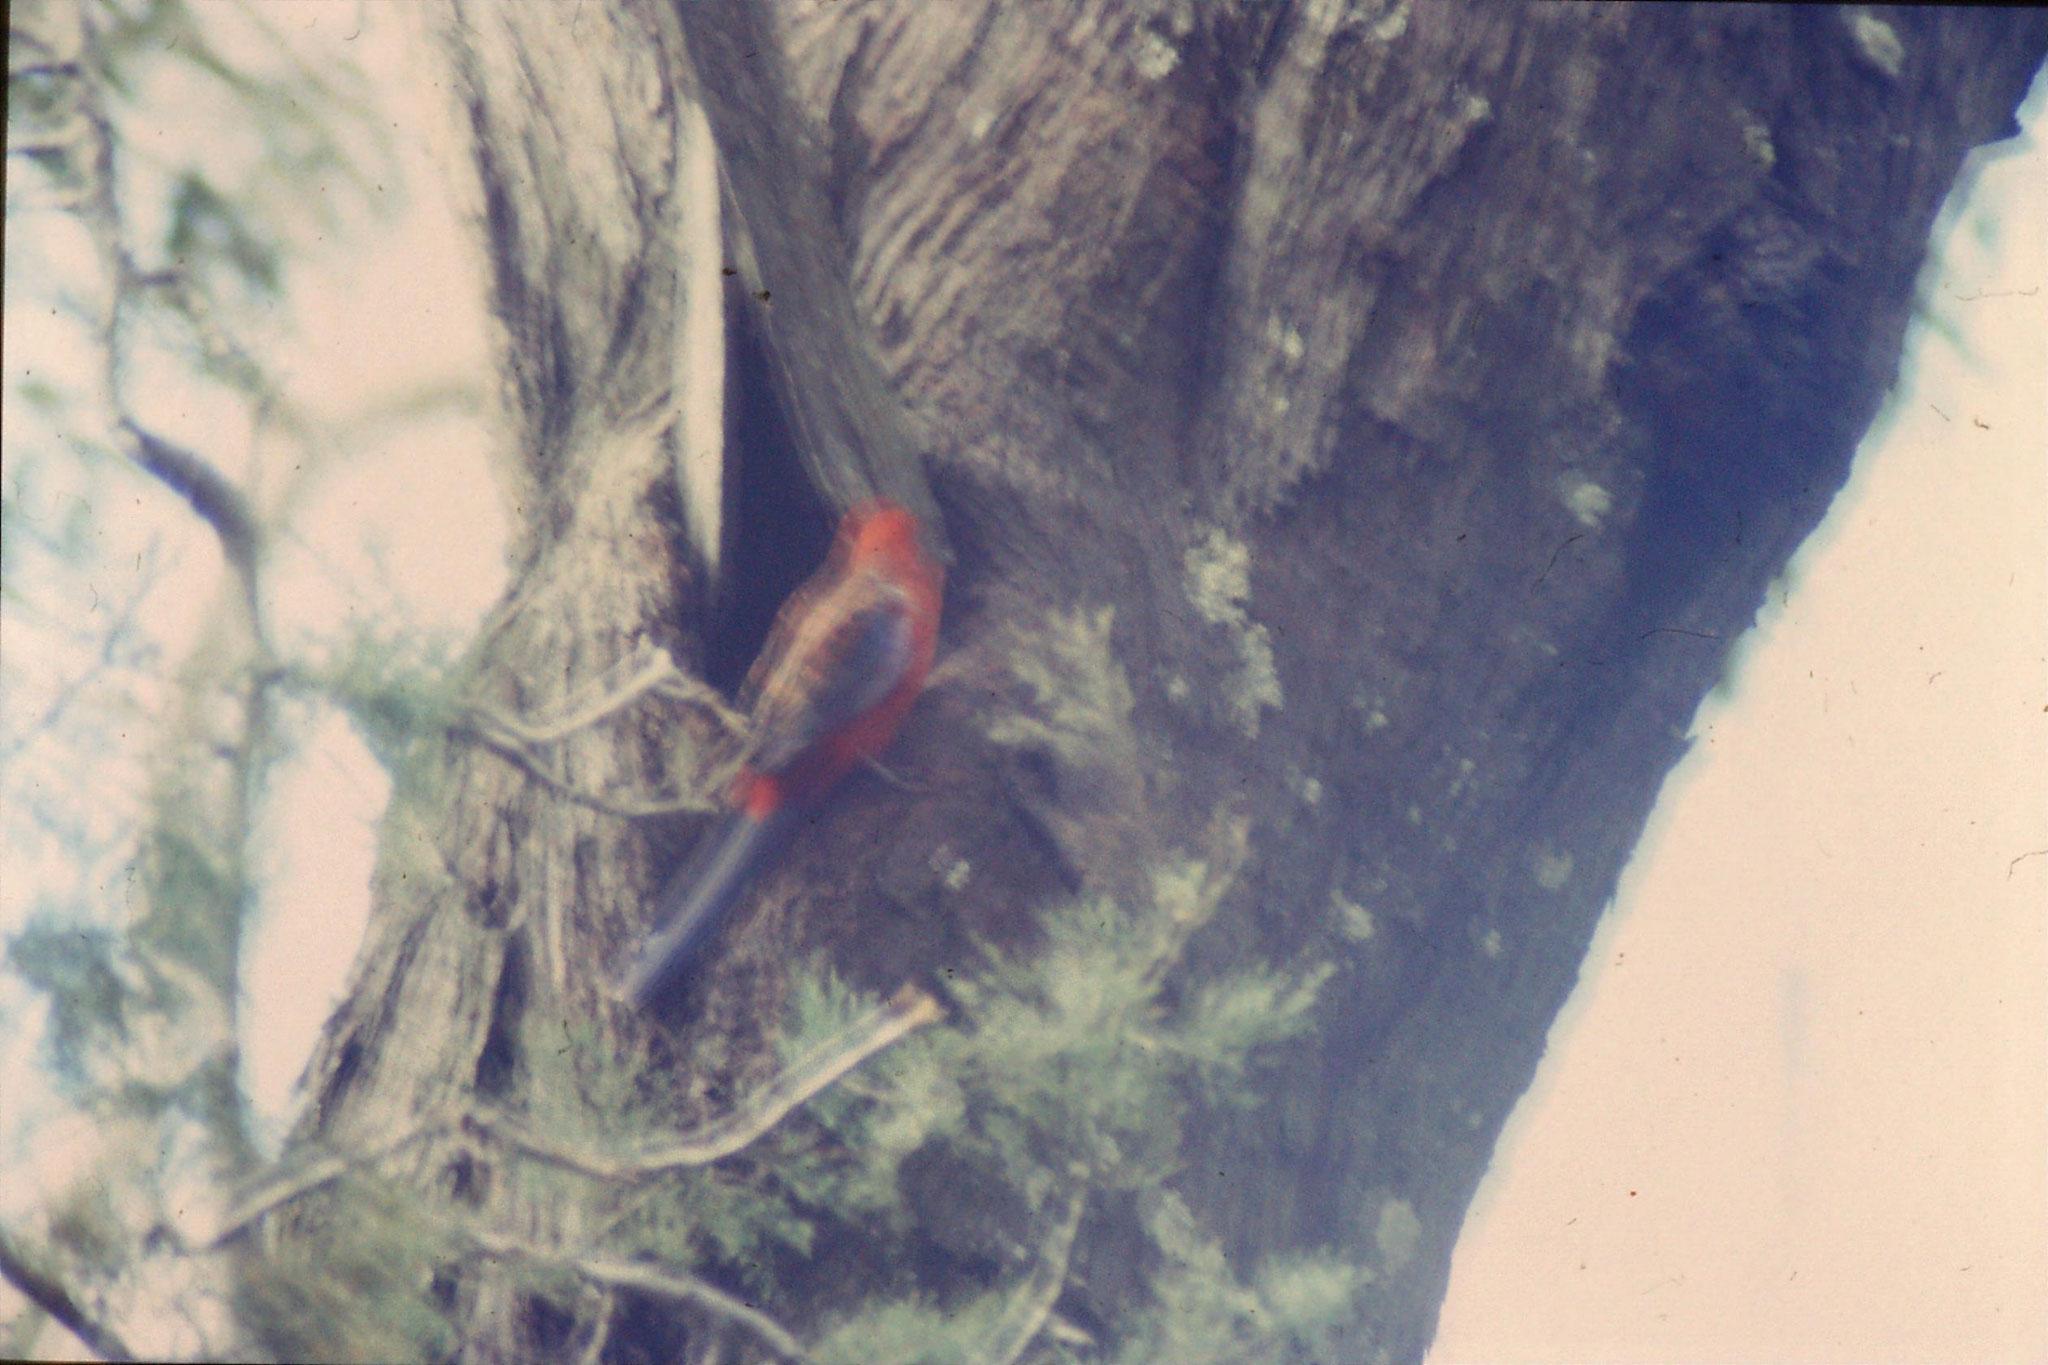 21/9/1990: 1: near Sundial picnic gound, crimson rosella